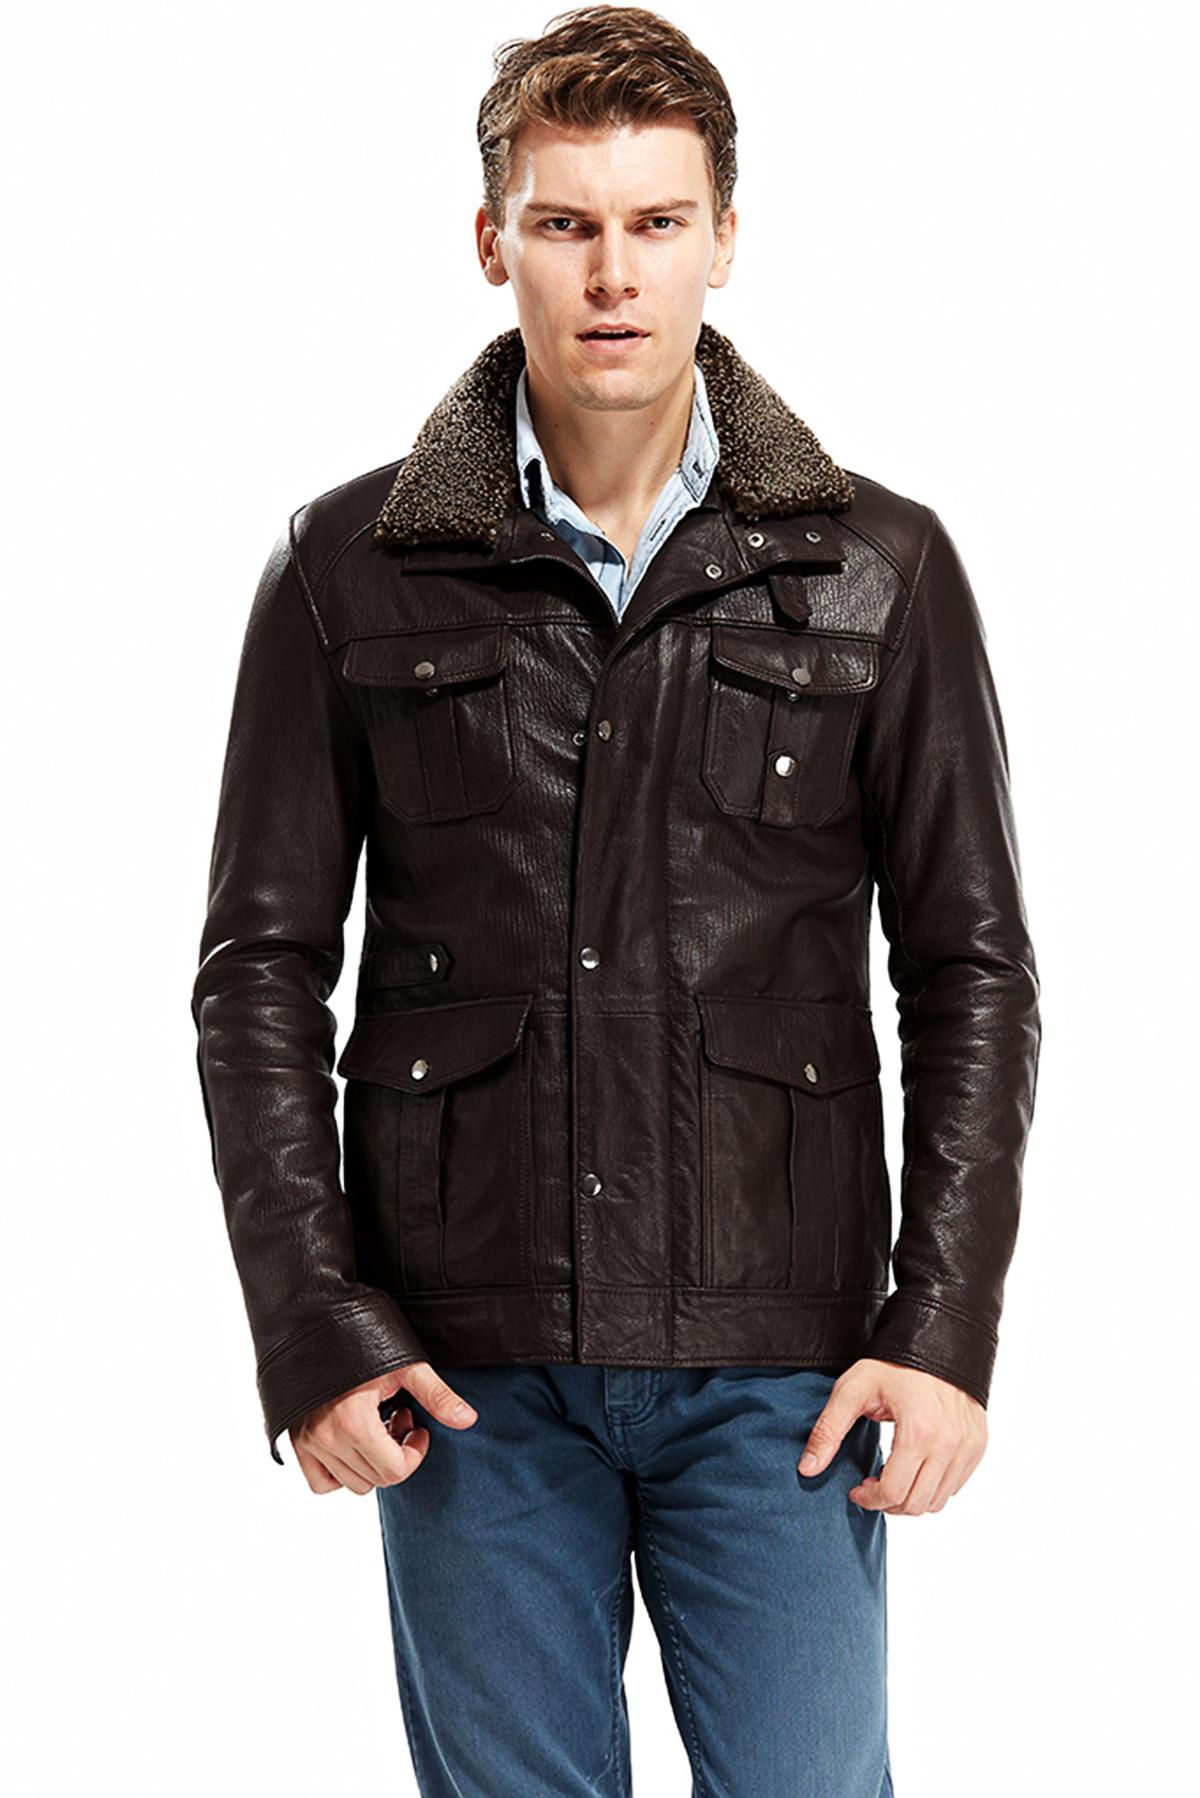 Magento Brown Men's Leather Blouson